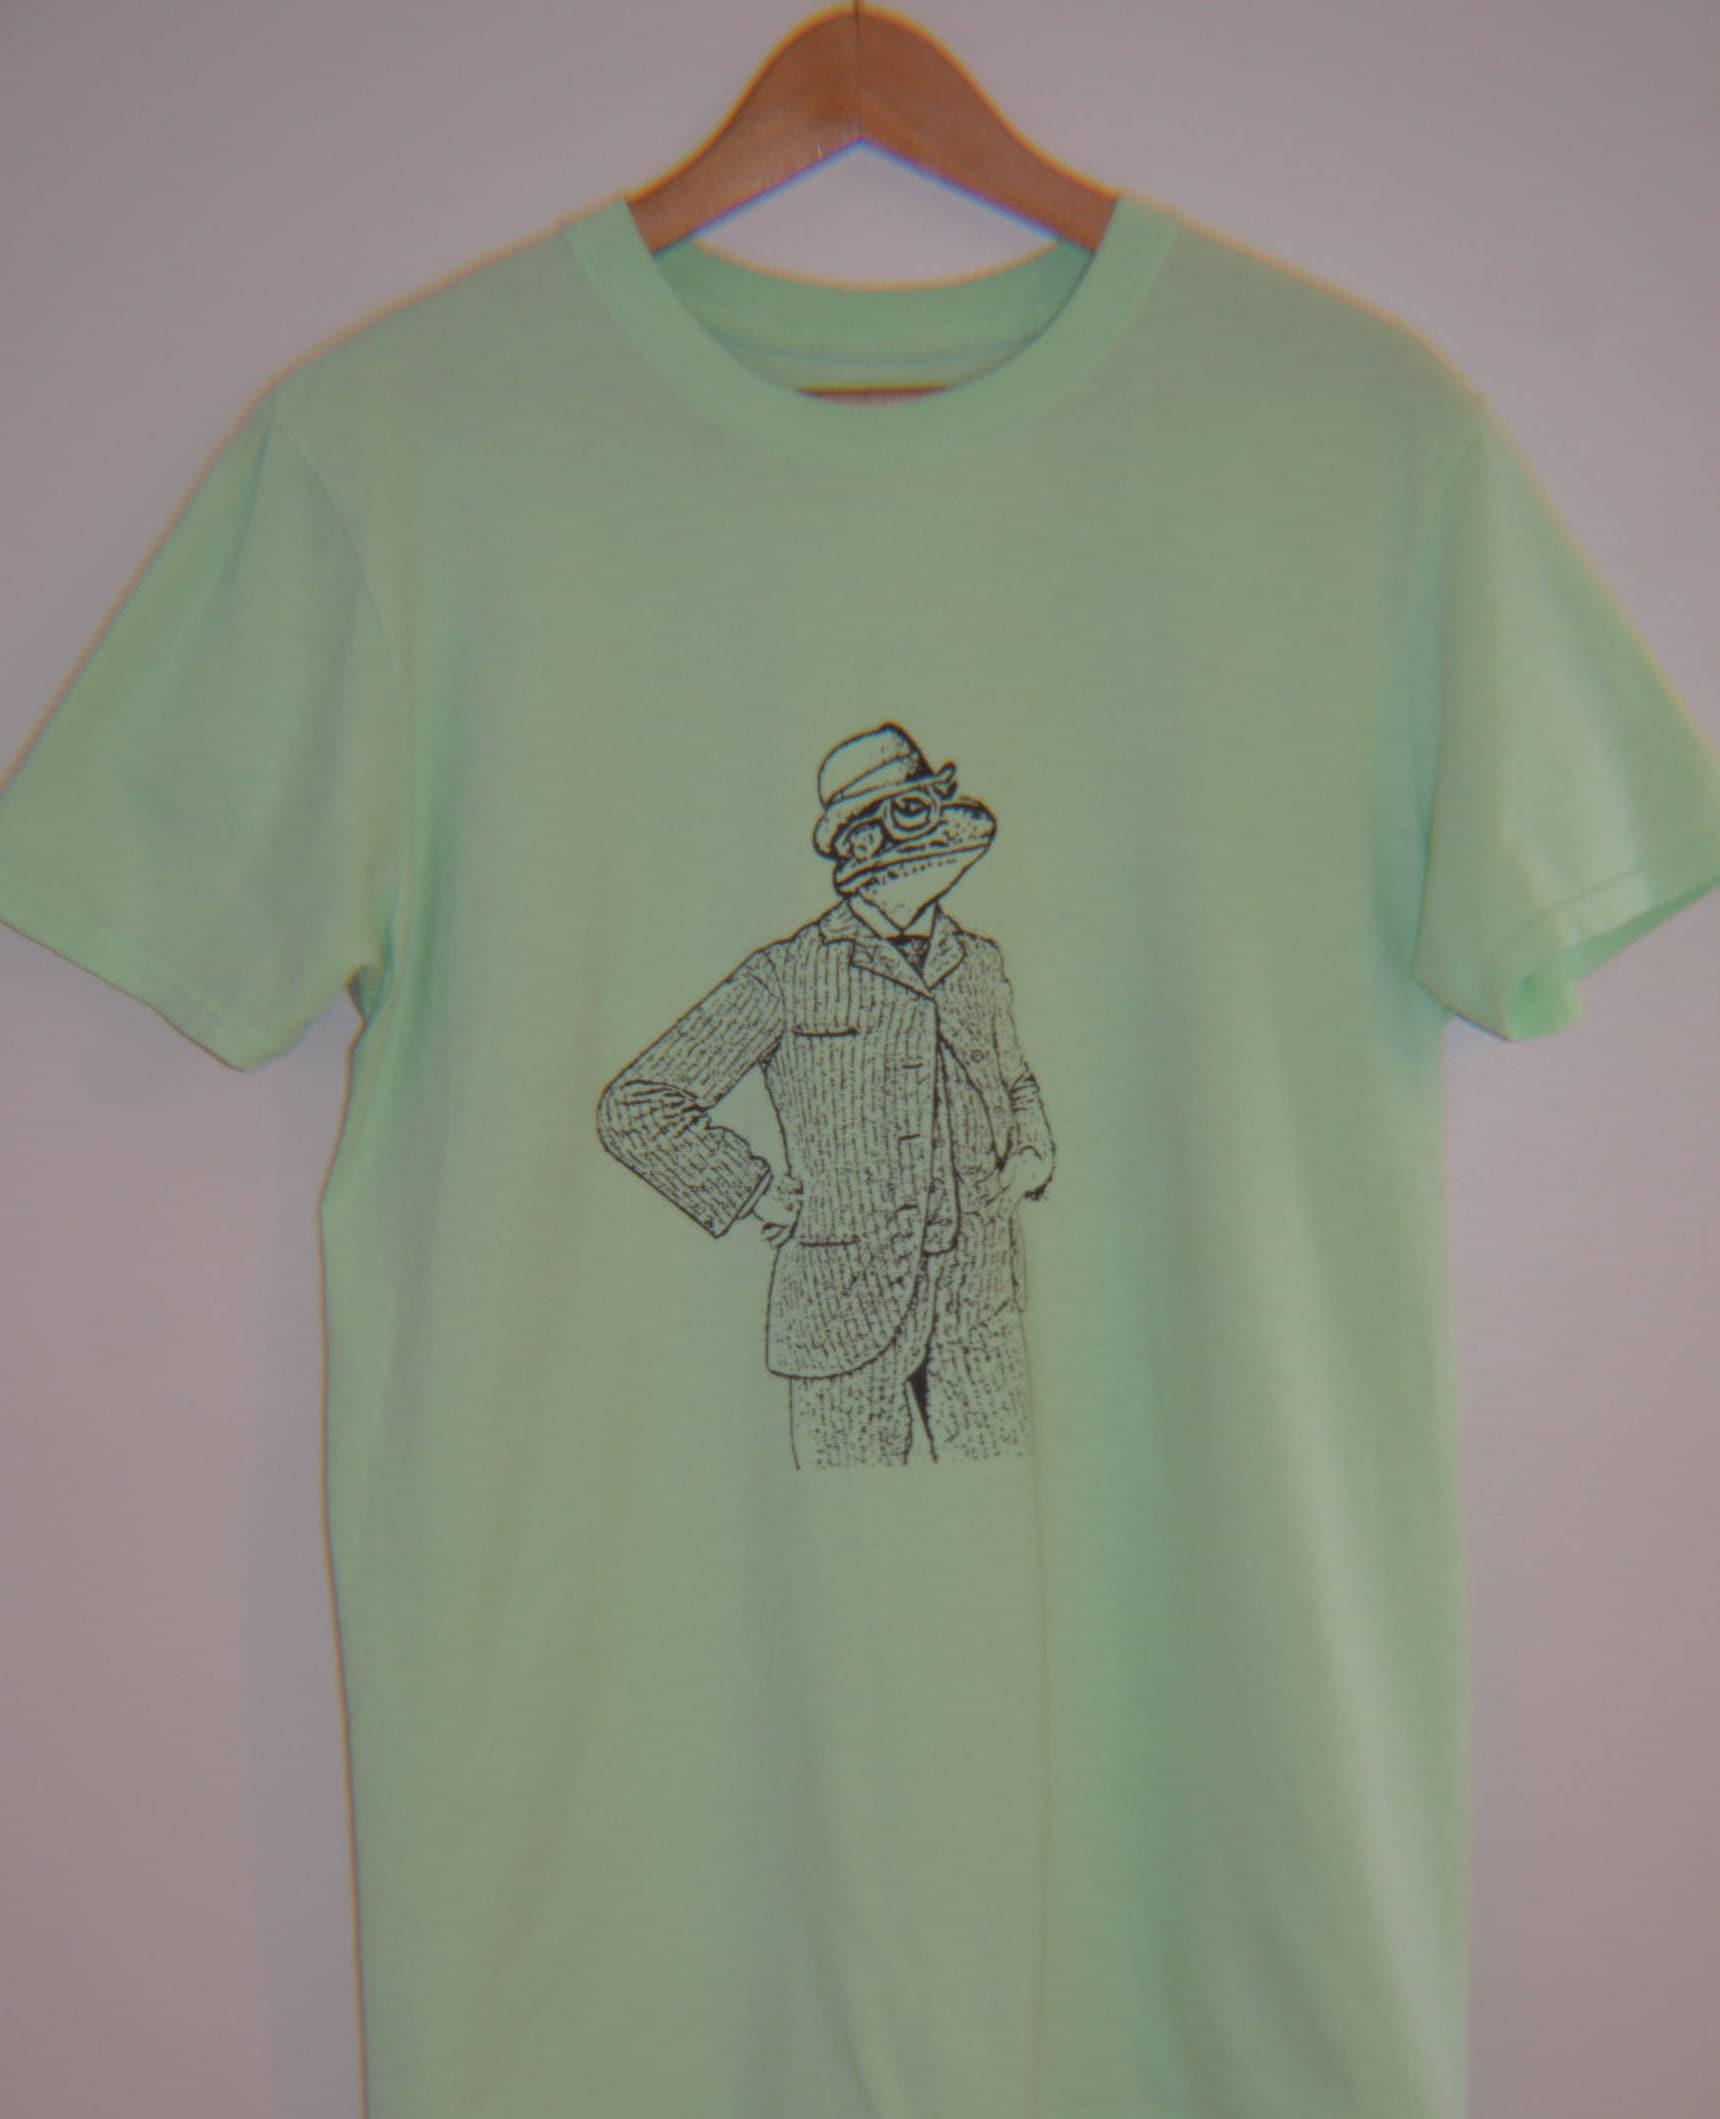 Youth T Shirt Funny Animal Shirt Frog Gentleman Youth T Shirt Screen